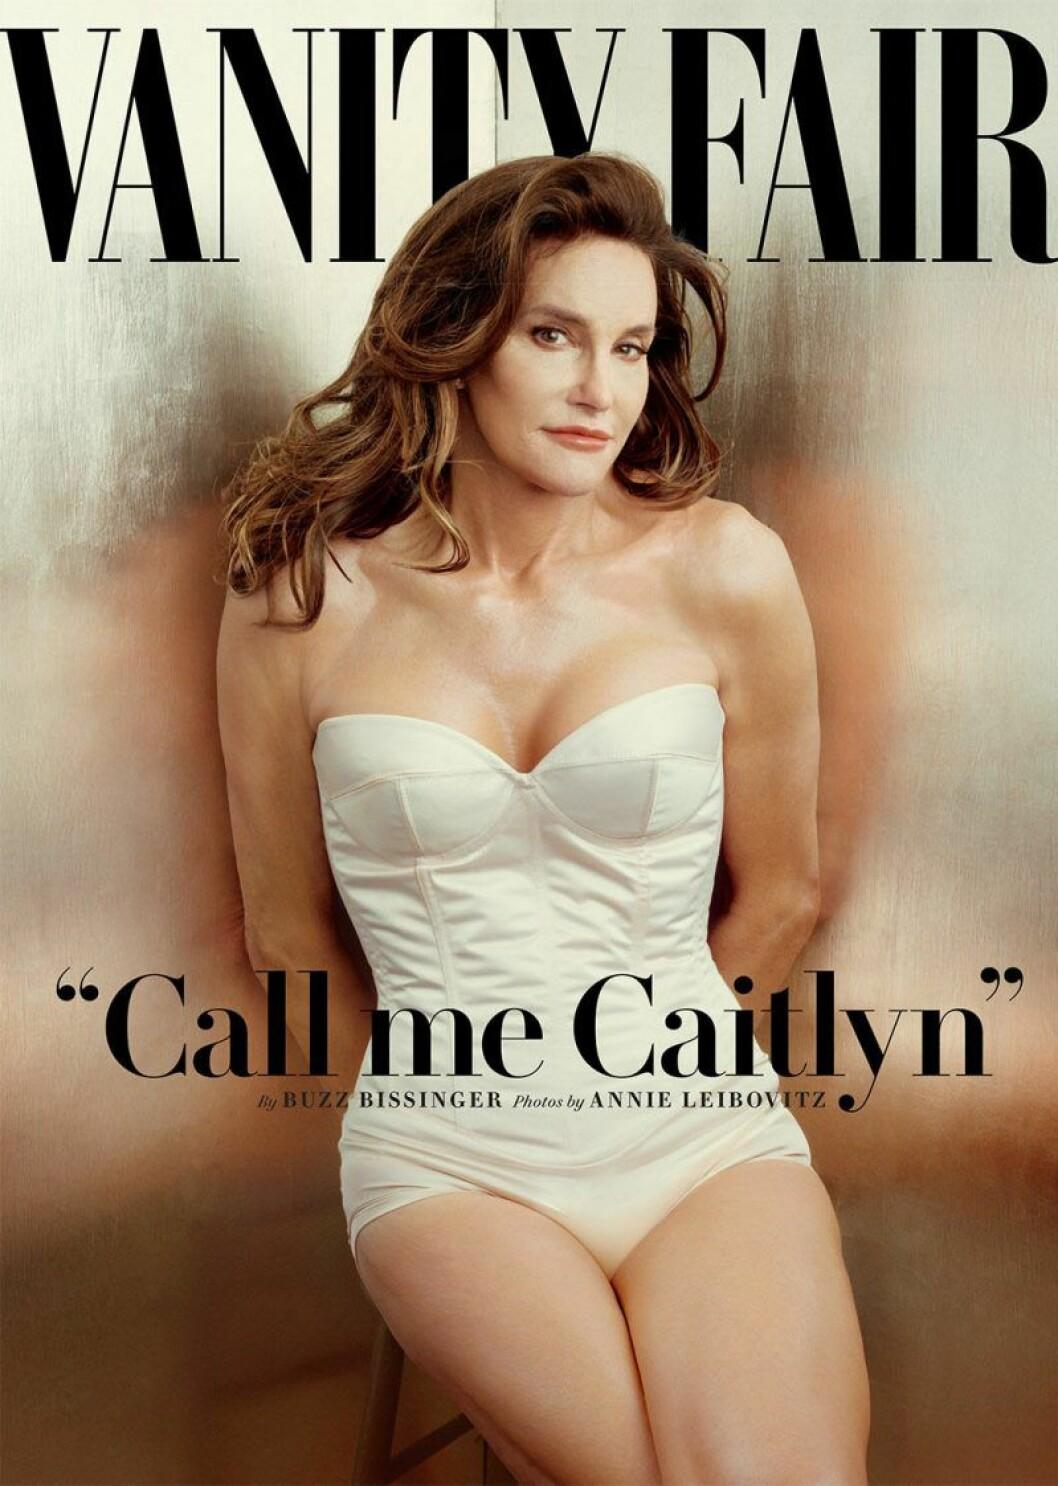 Caitlyn Jenner stå i en vit body med händerna bakom ryggen